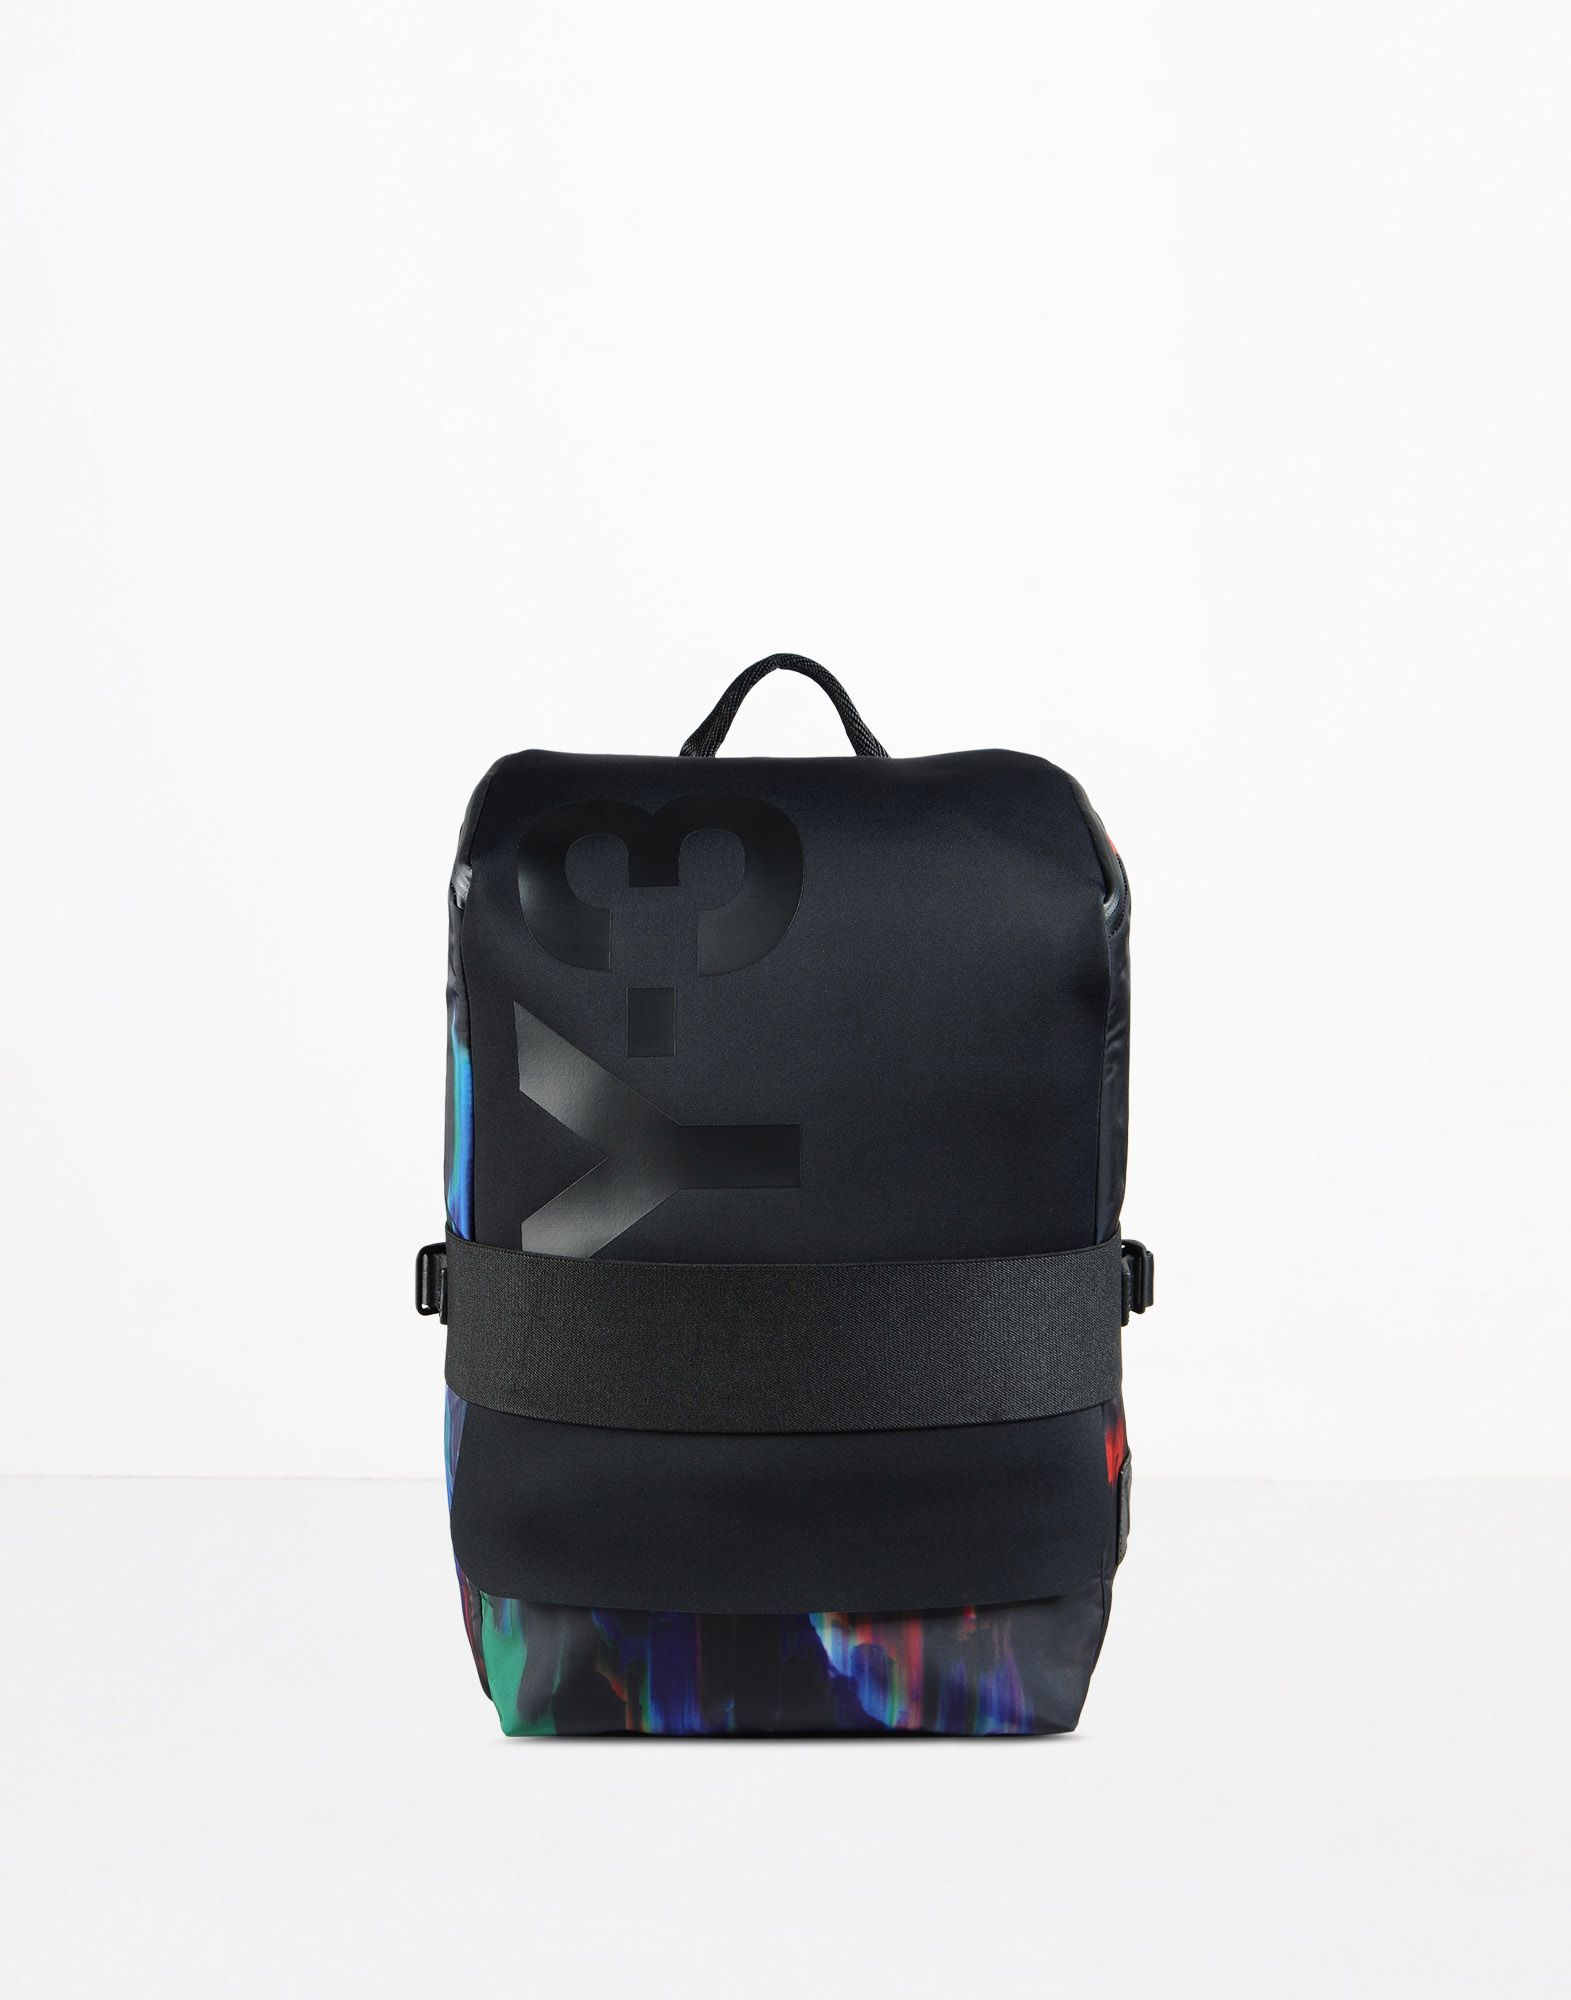 b1c9a878f8a8 ... Y-3 Y-3 QASA S BACKPACK Backpack E ...